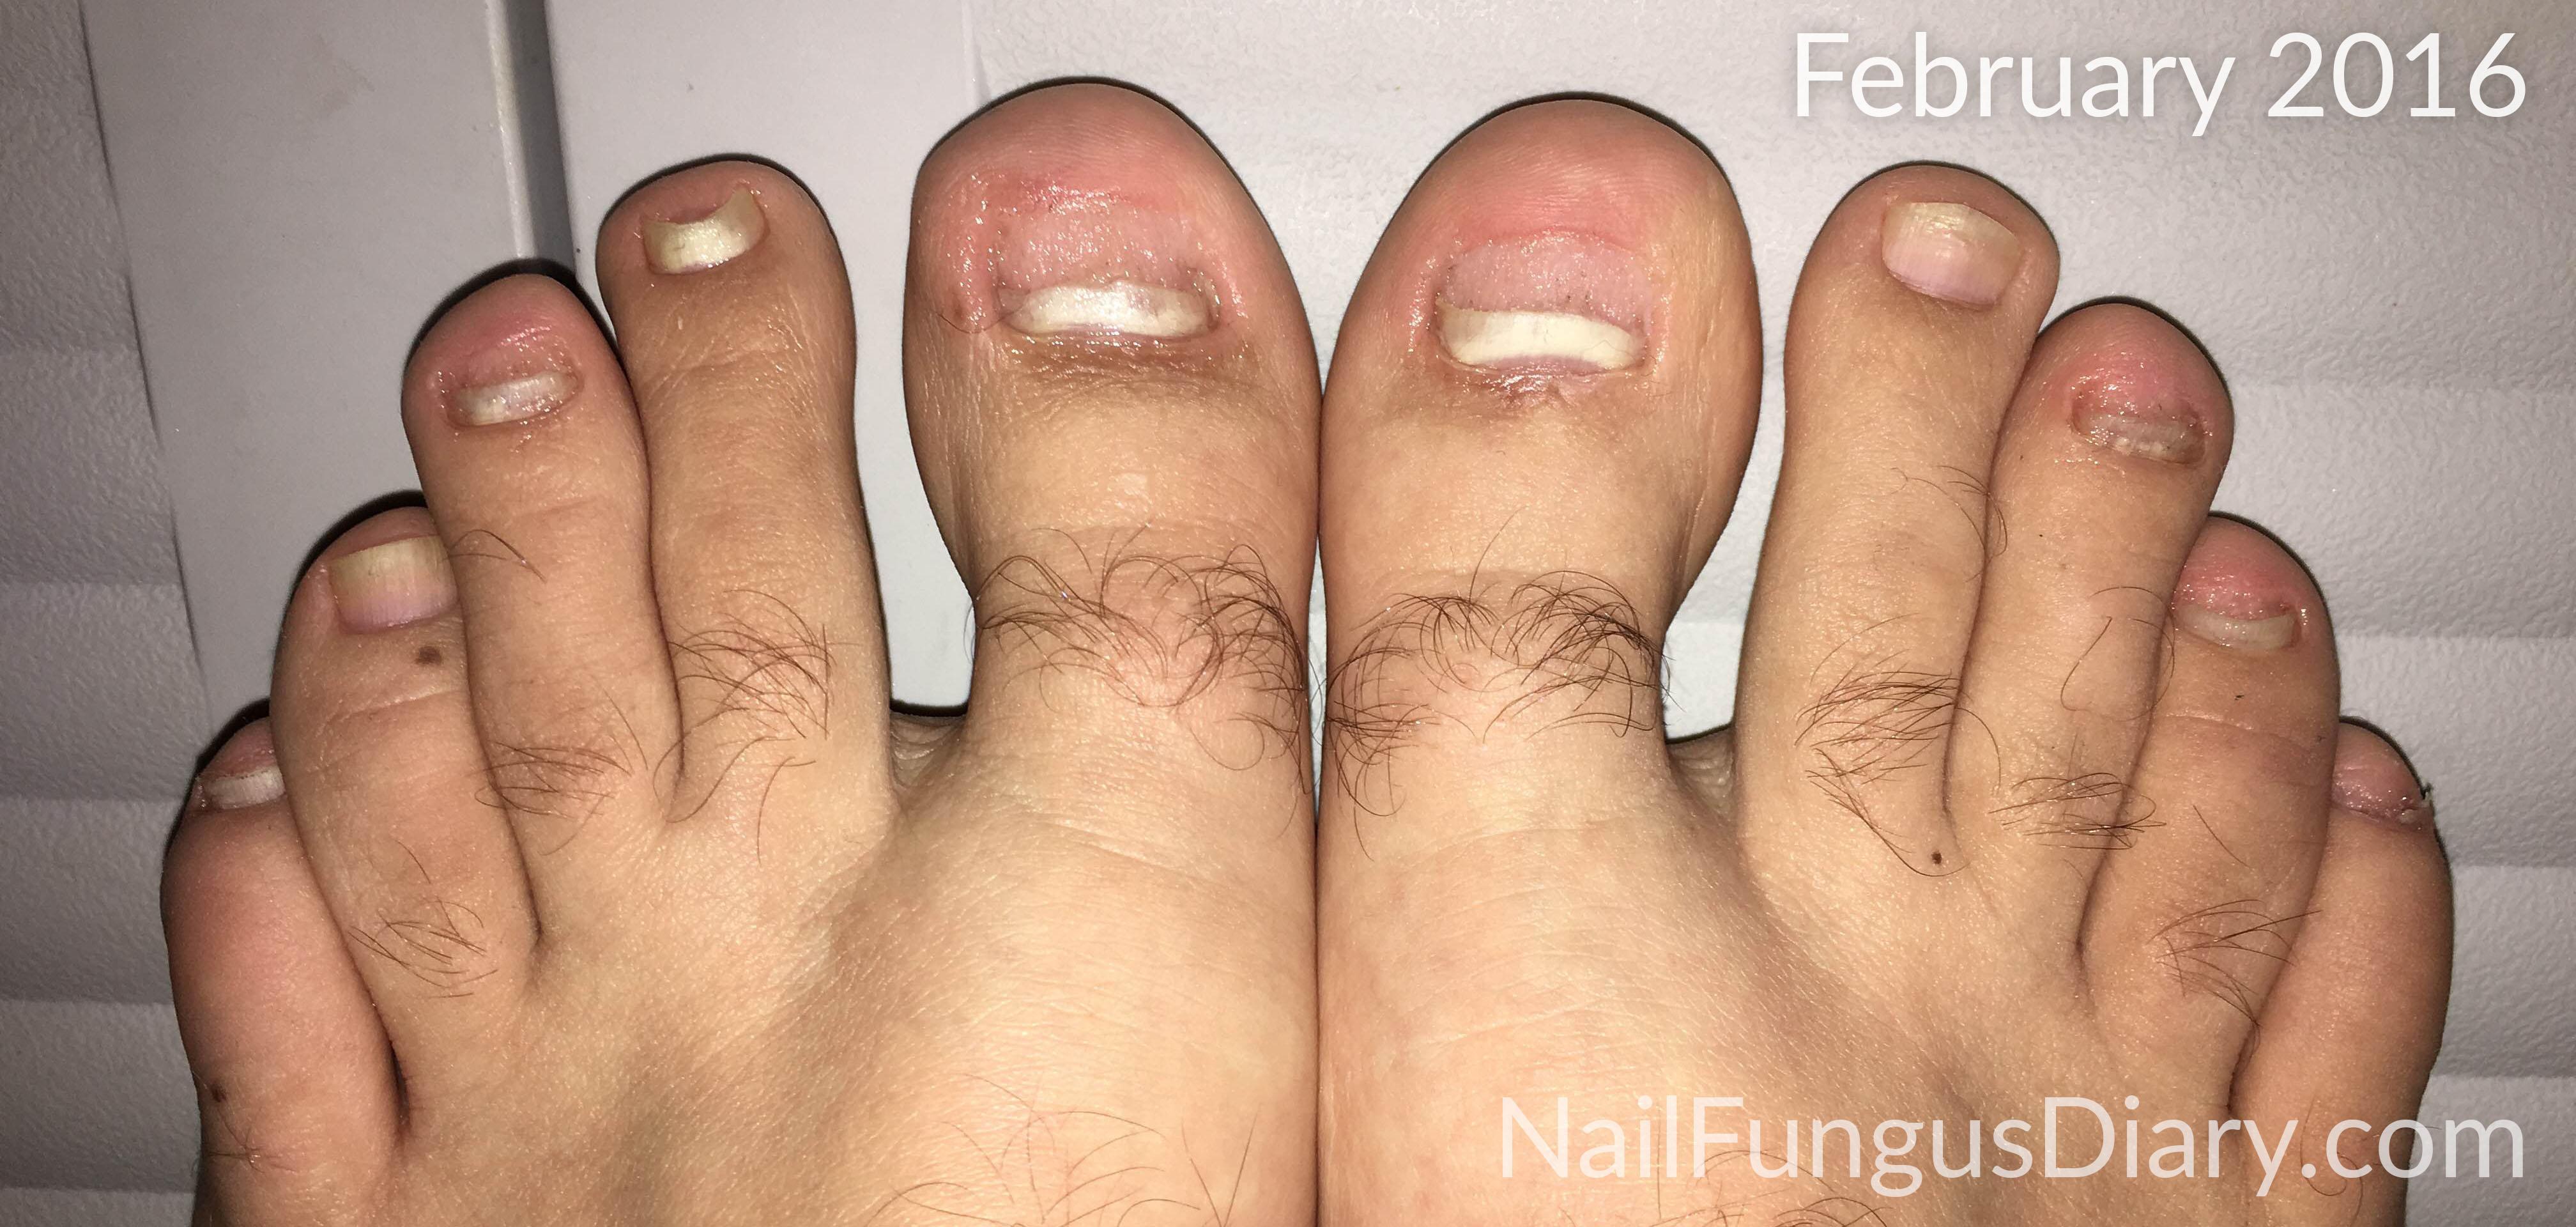 Nail Fungus Update, February 2016